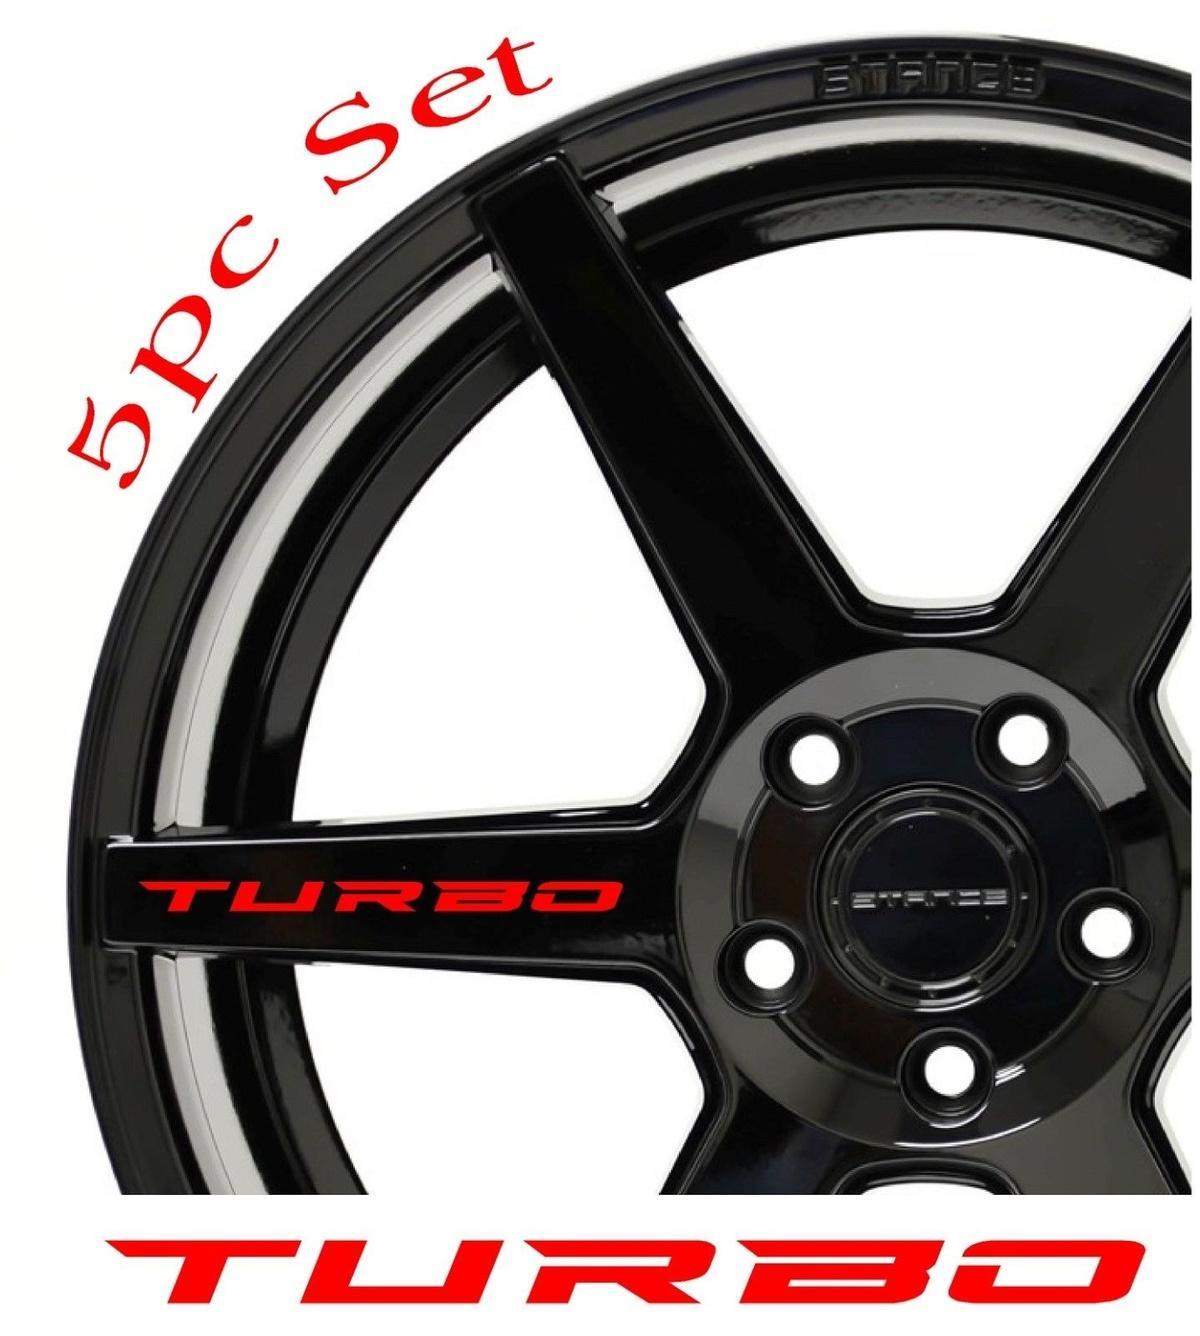 2019 For X8 Turbo Decal Sticker Wheels Rims Racing Sport Car Sticker